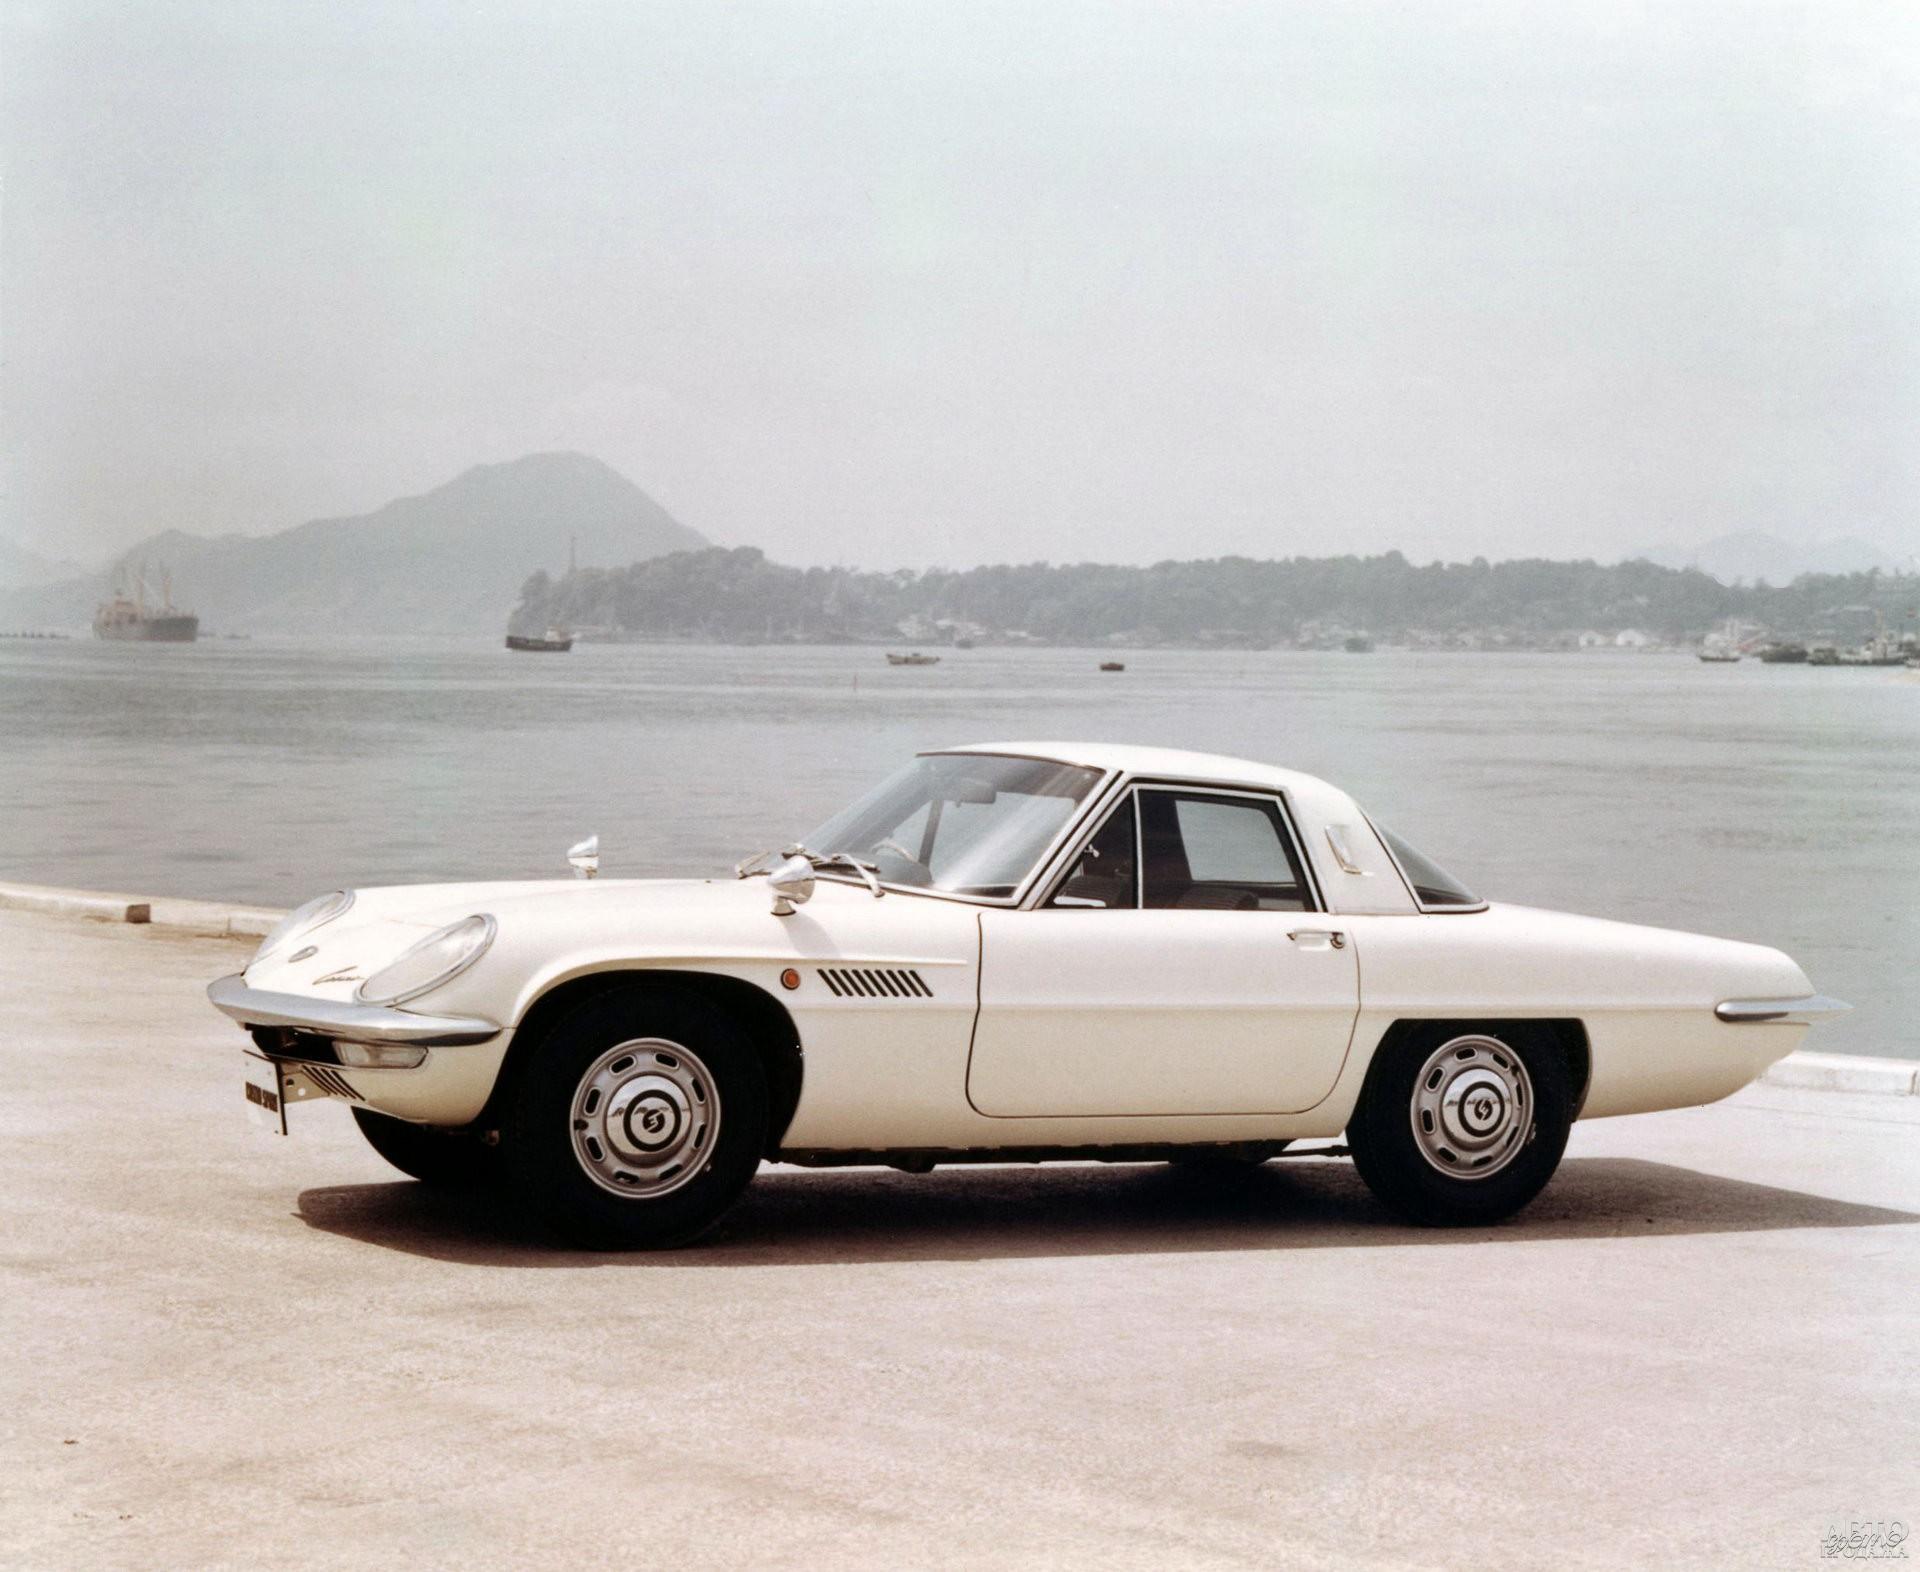 Mаzdа Cosmo Sport 1967 года – роторно-поршневый первенец марки